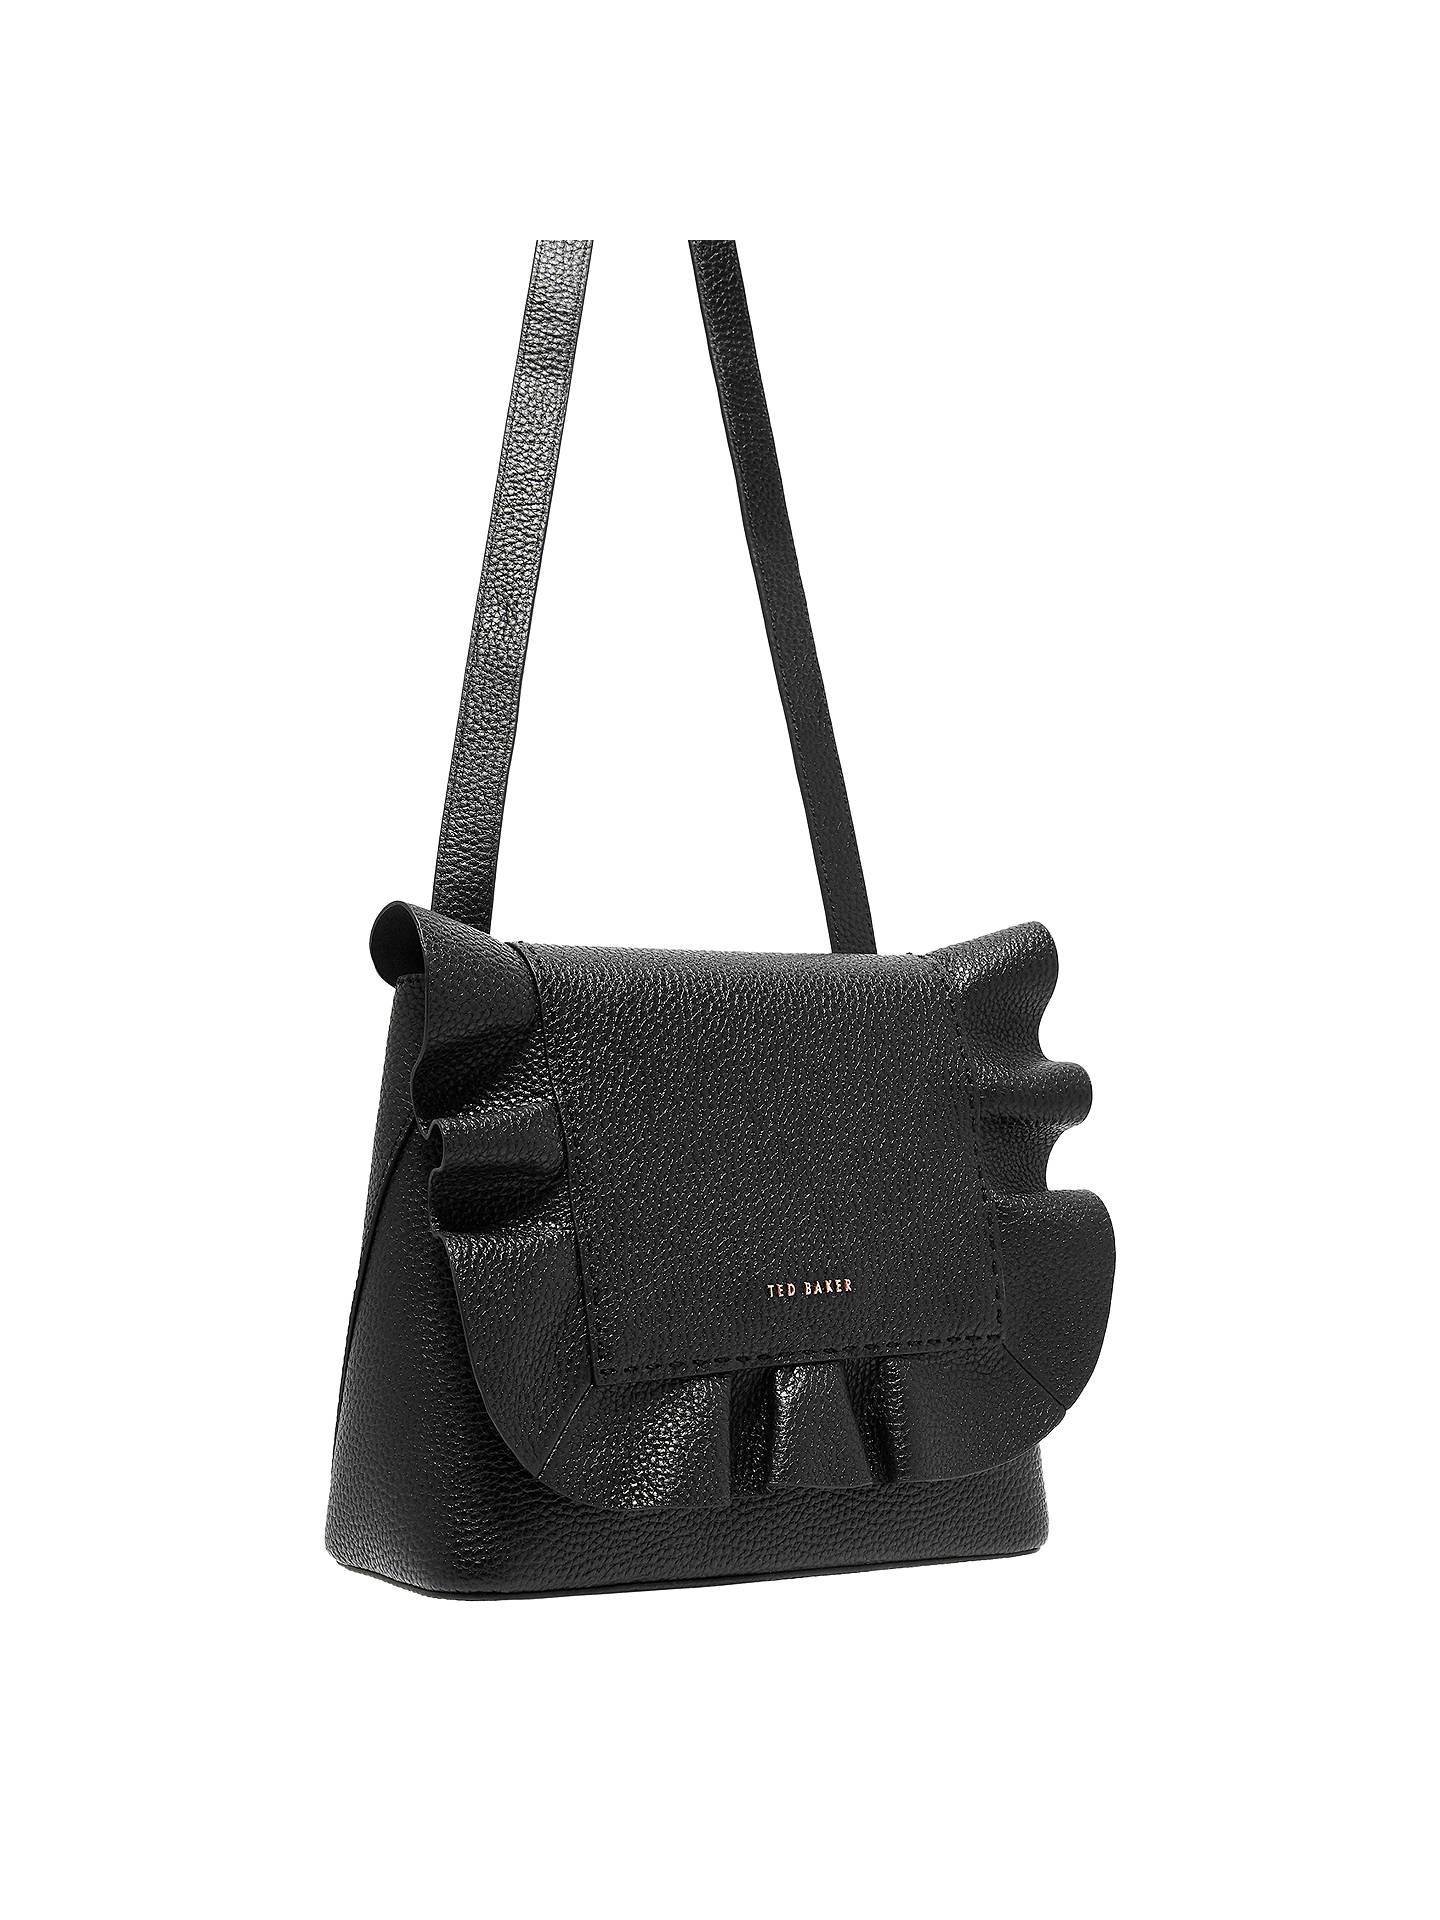 83e1262202fdbd Ted Baker Rammira Leather Shoulder Bag at John Lewis   Partners